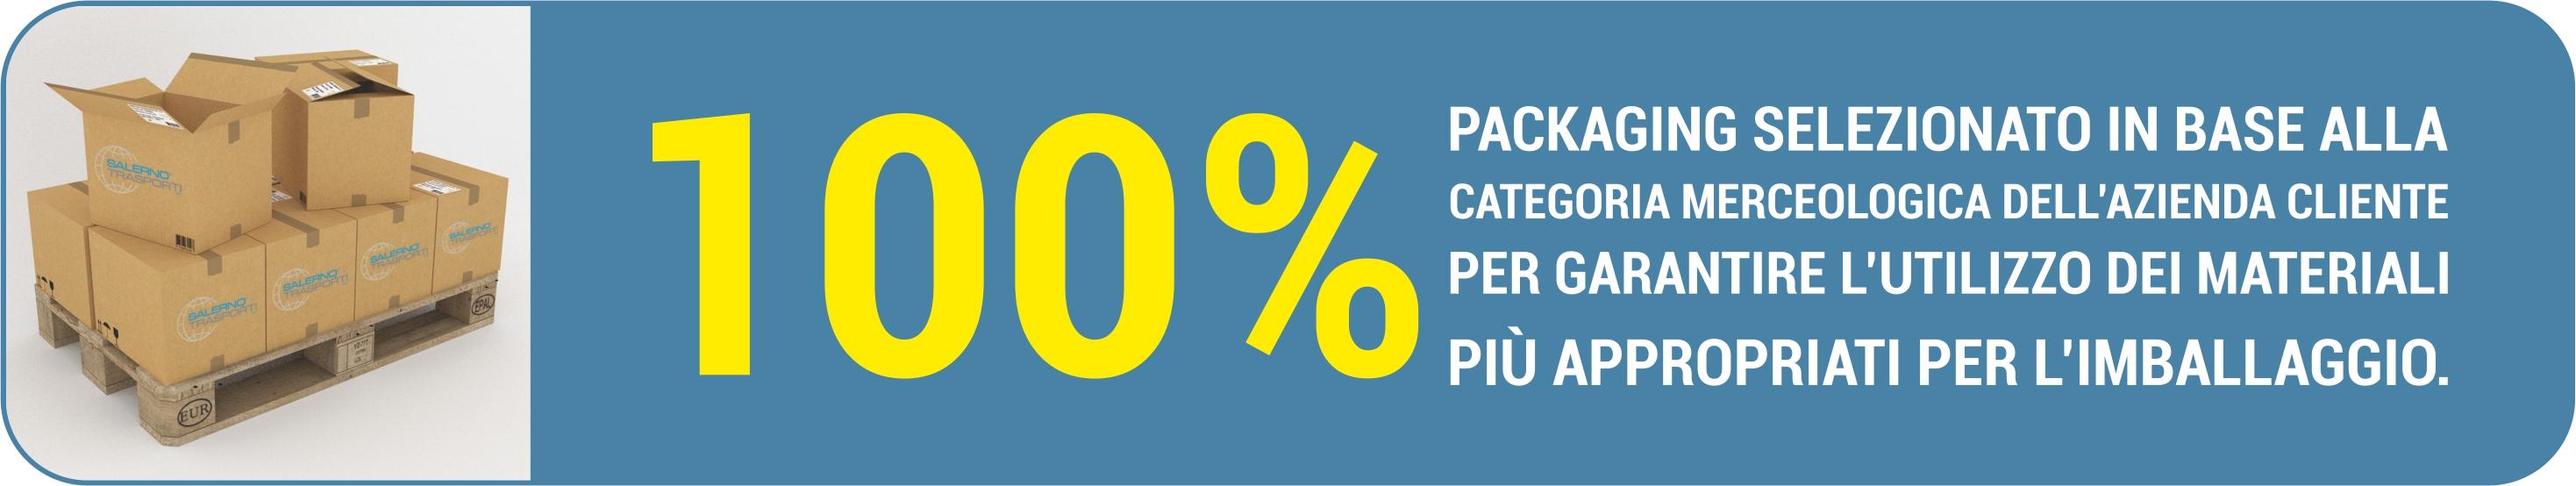 pack 01